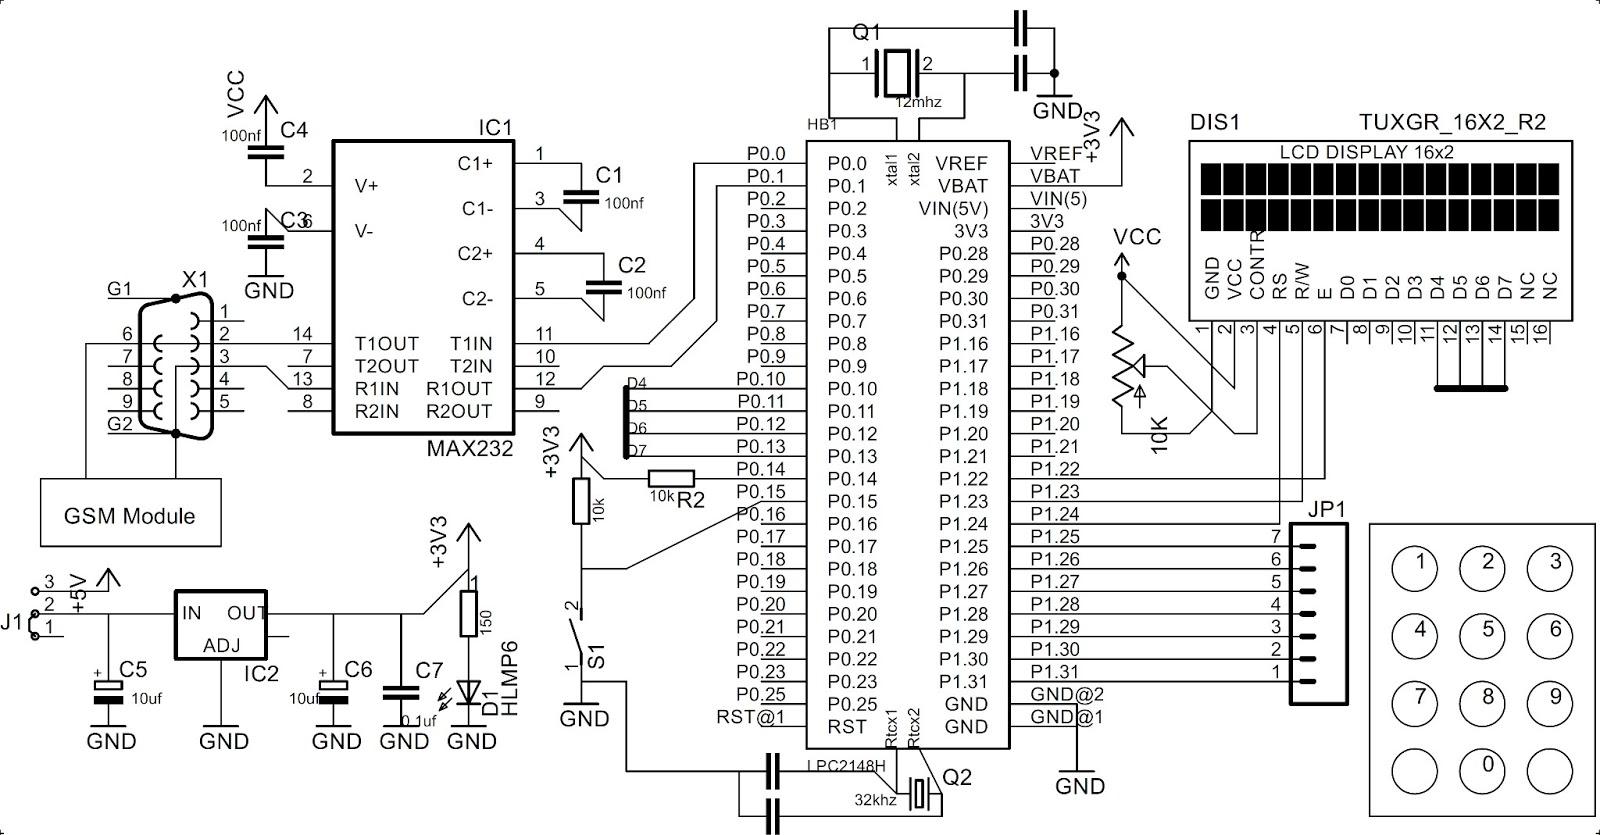 circuitdiagramtointerfacekeypadwithlpc2148